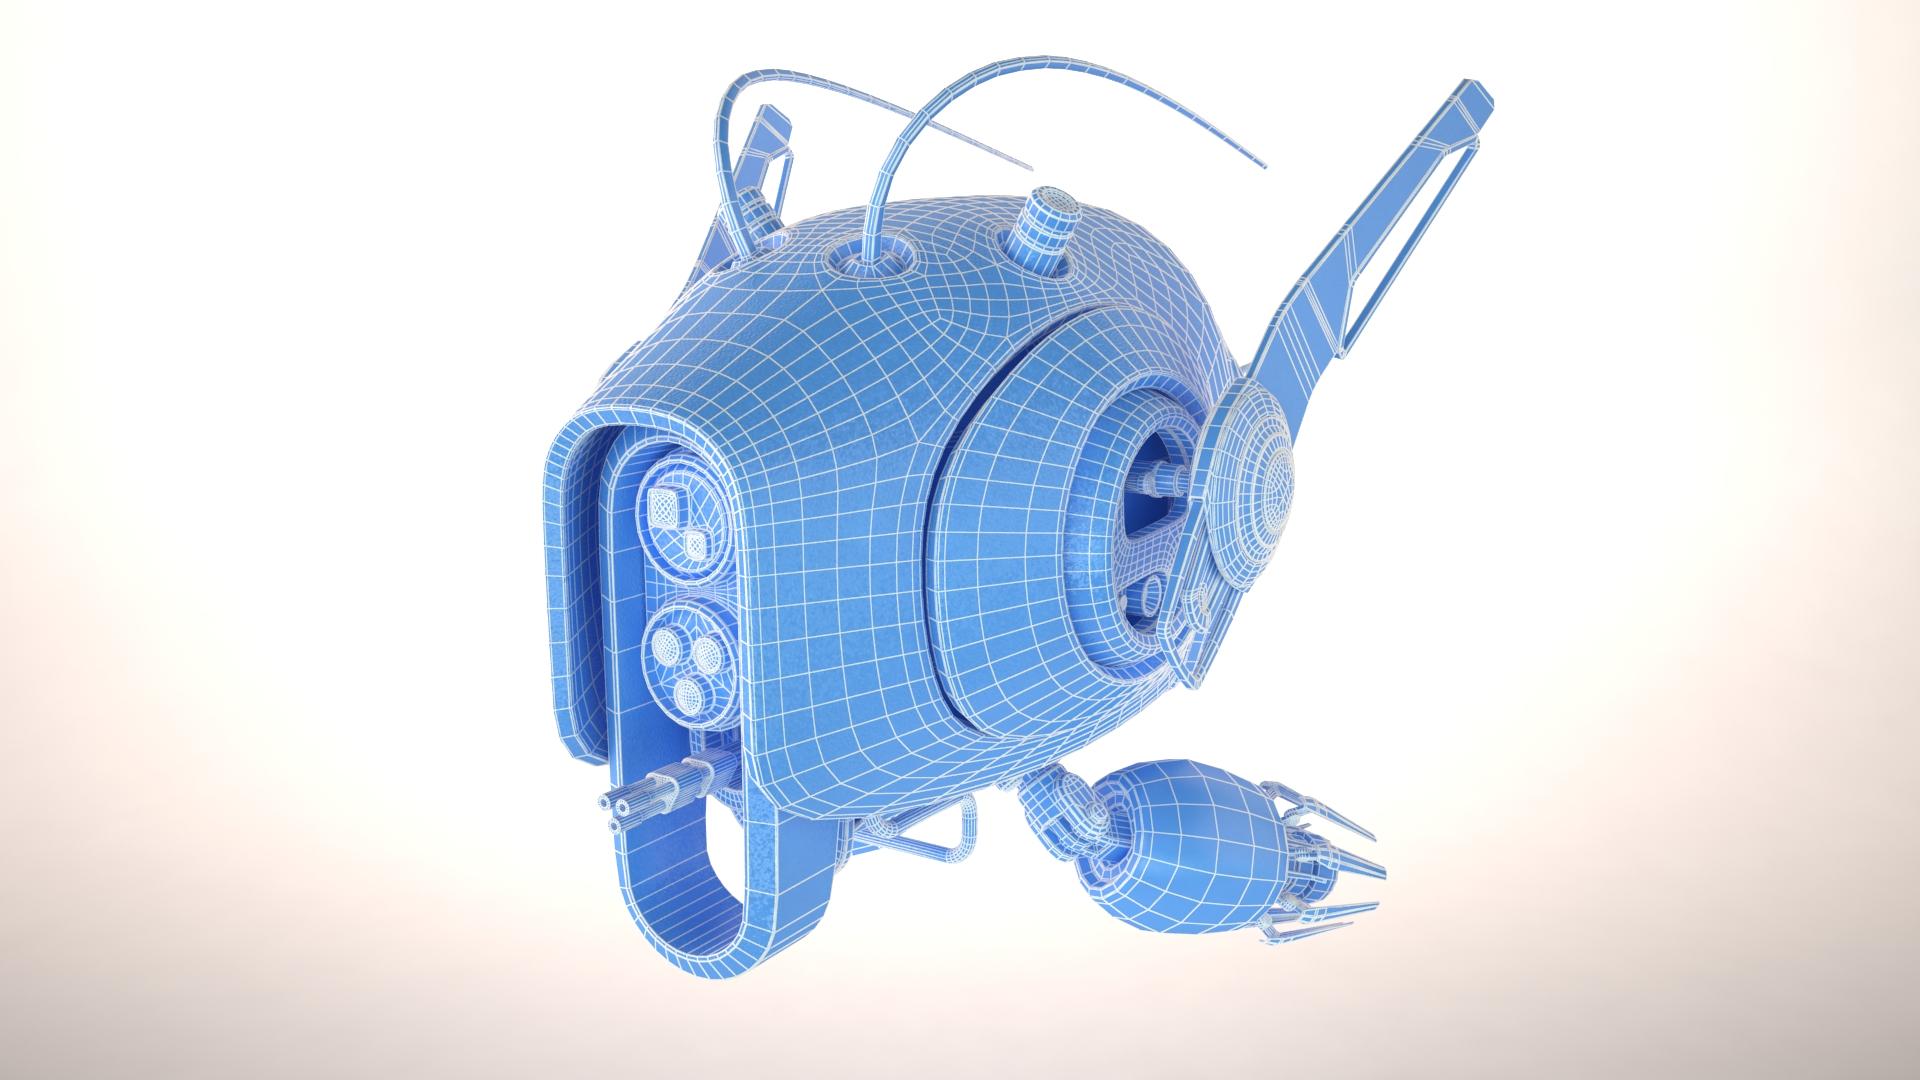 drone sxz600 3d líkan 3ds max fbx obj 267285